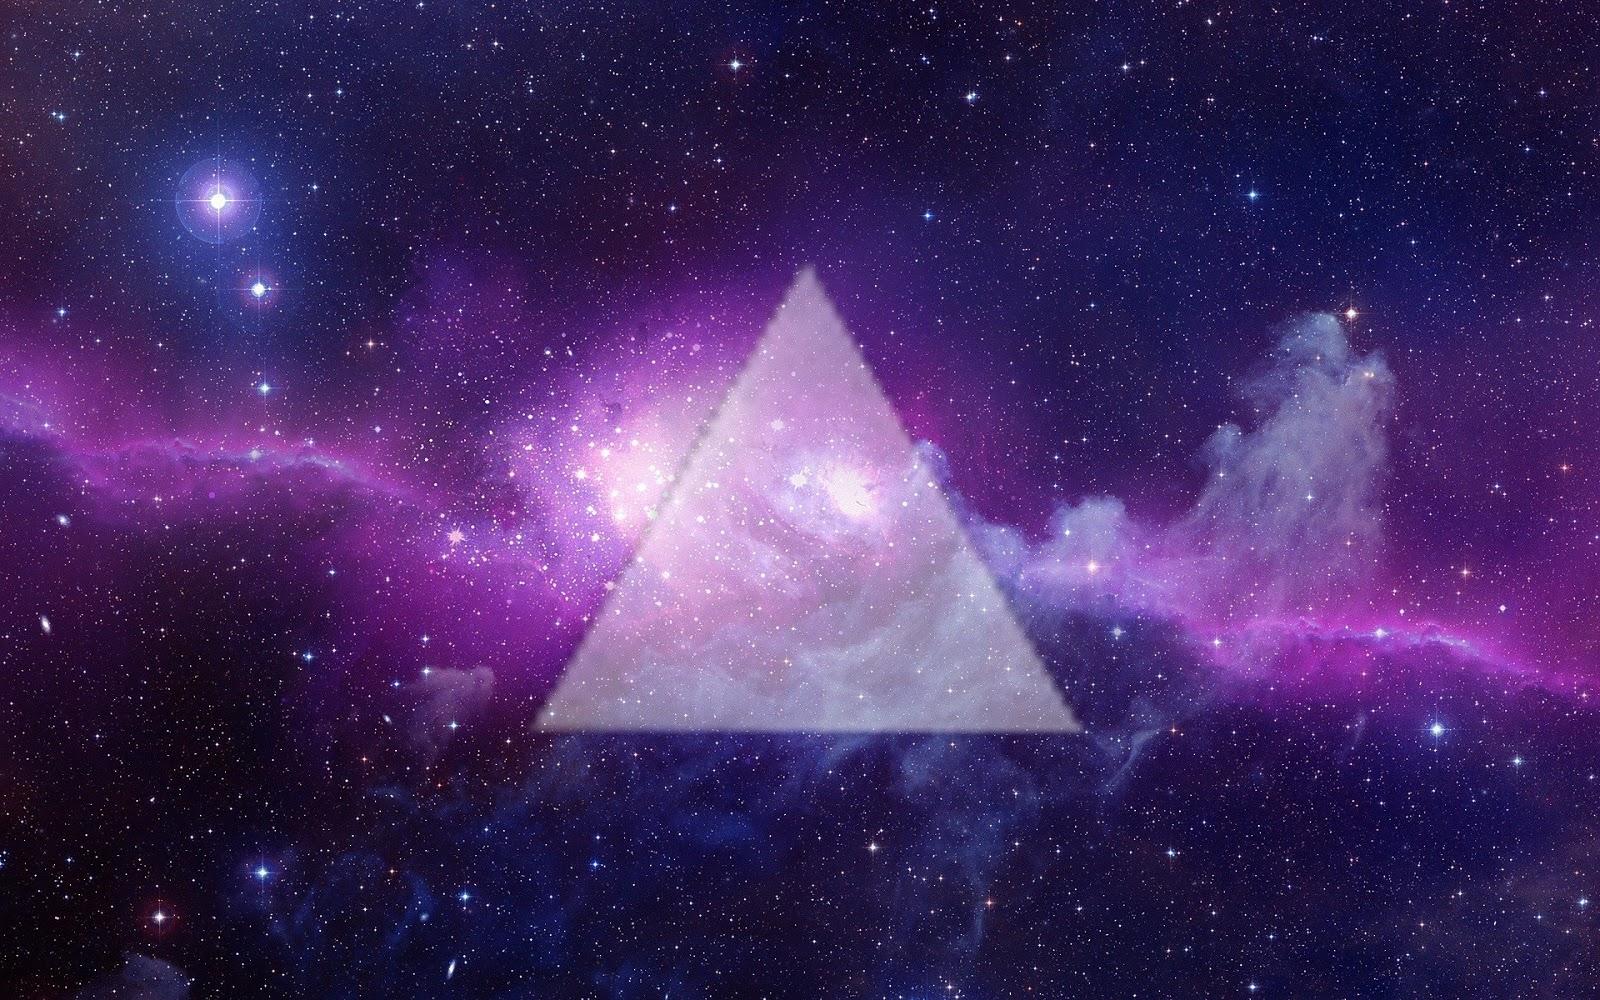 Galaxy Wallpaper Tumblr: Galaxy Hipster Wallpaper